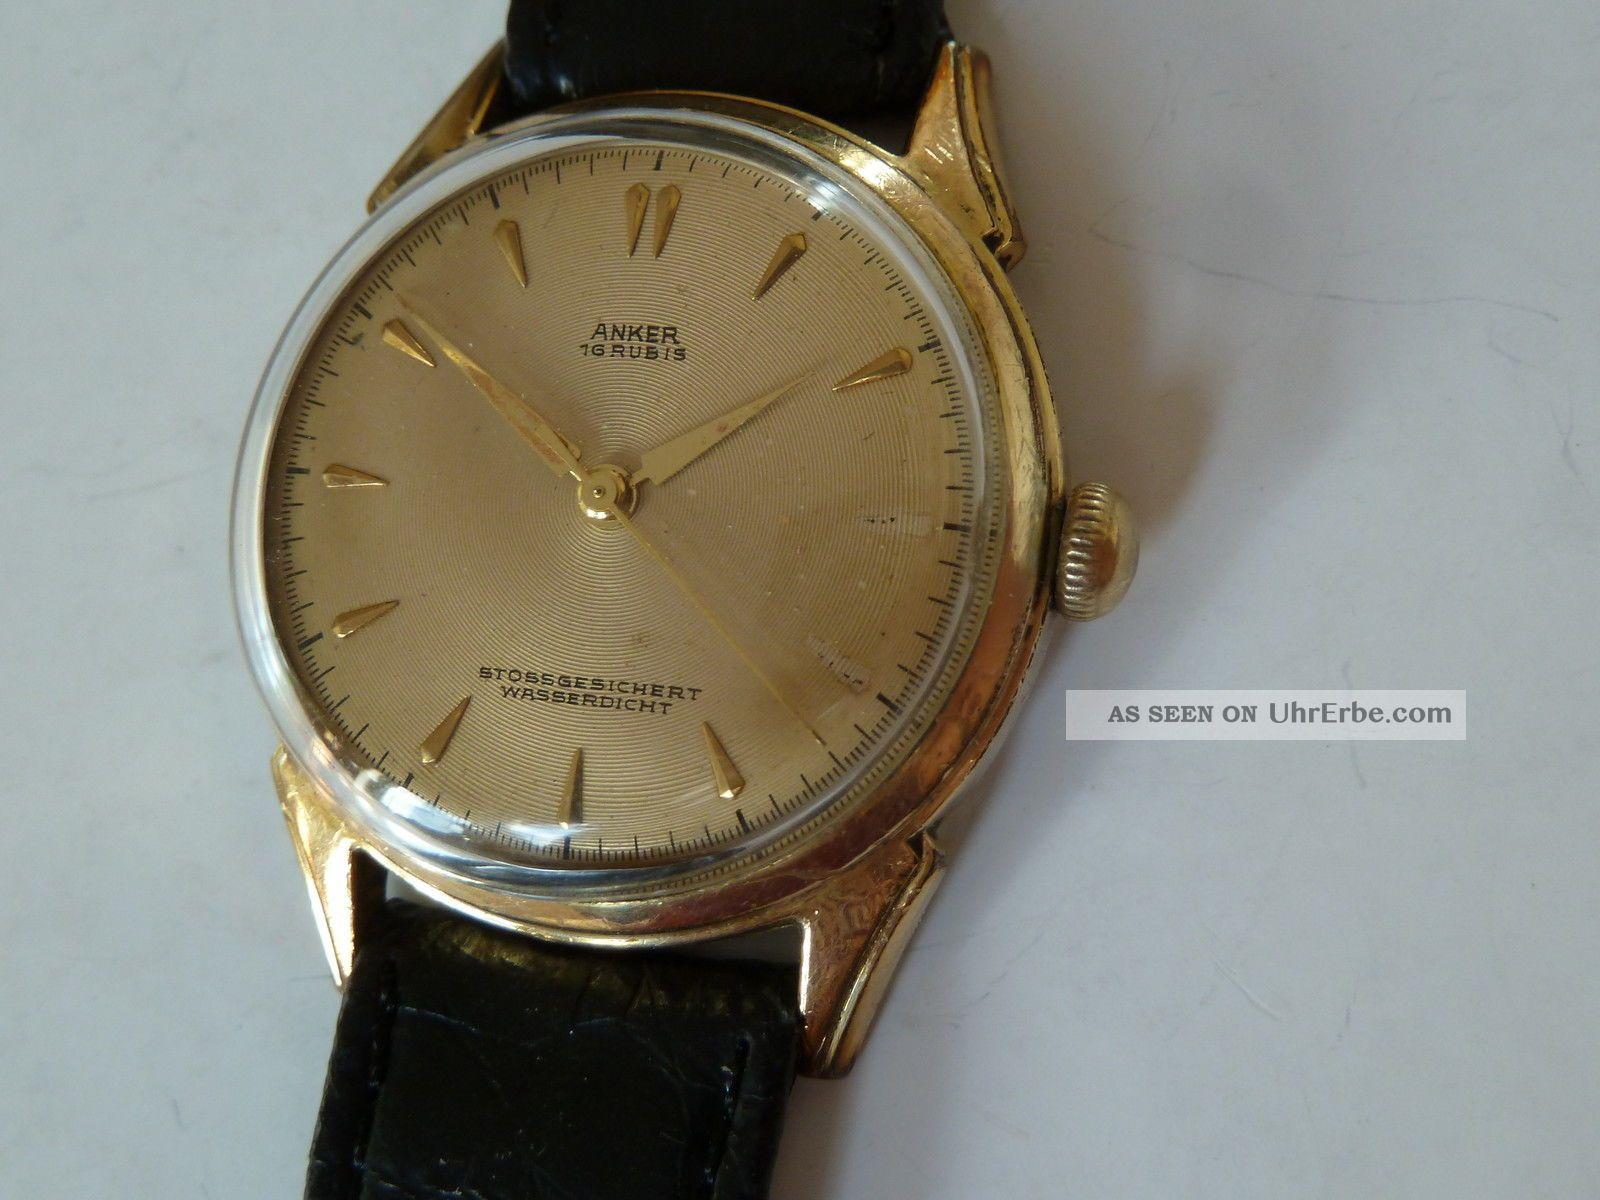 Elegante Goldene Handaufzug Analoguhr Von Anker Armbanduhren Bild